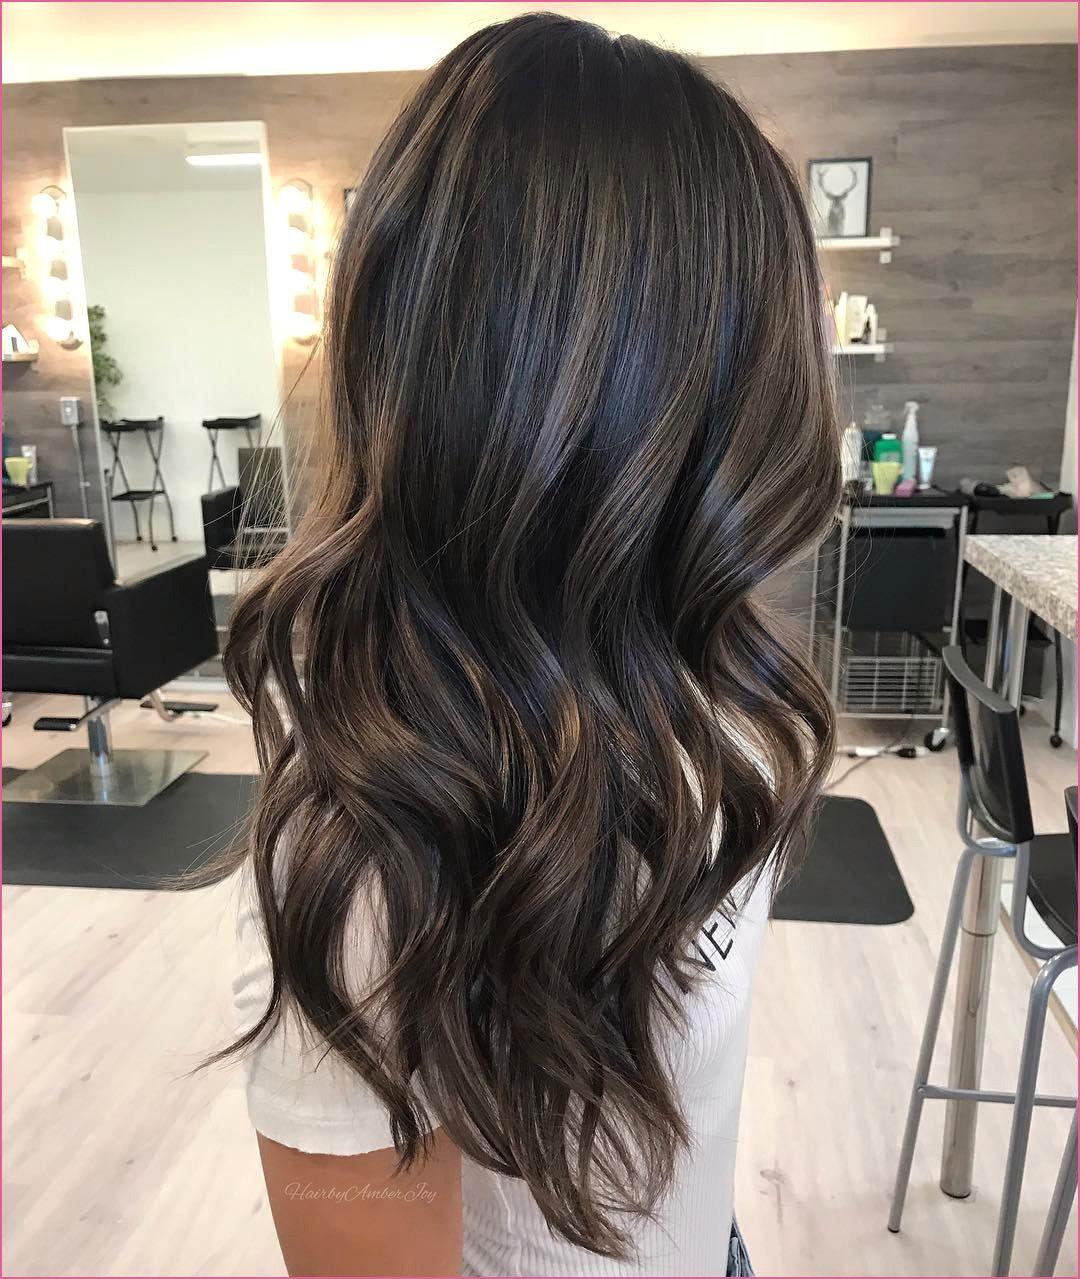 genial Braune Haare Ombre   Balayage braune haare